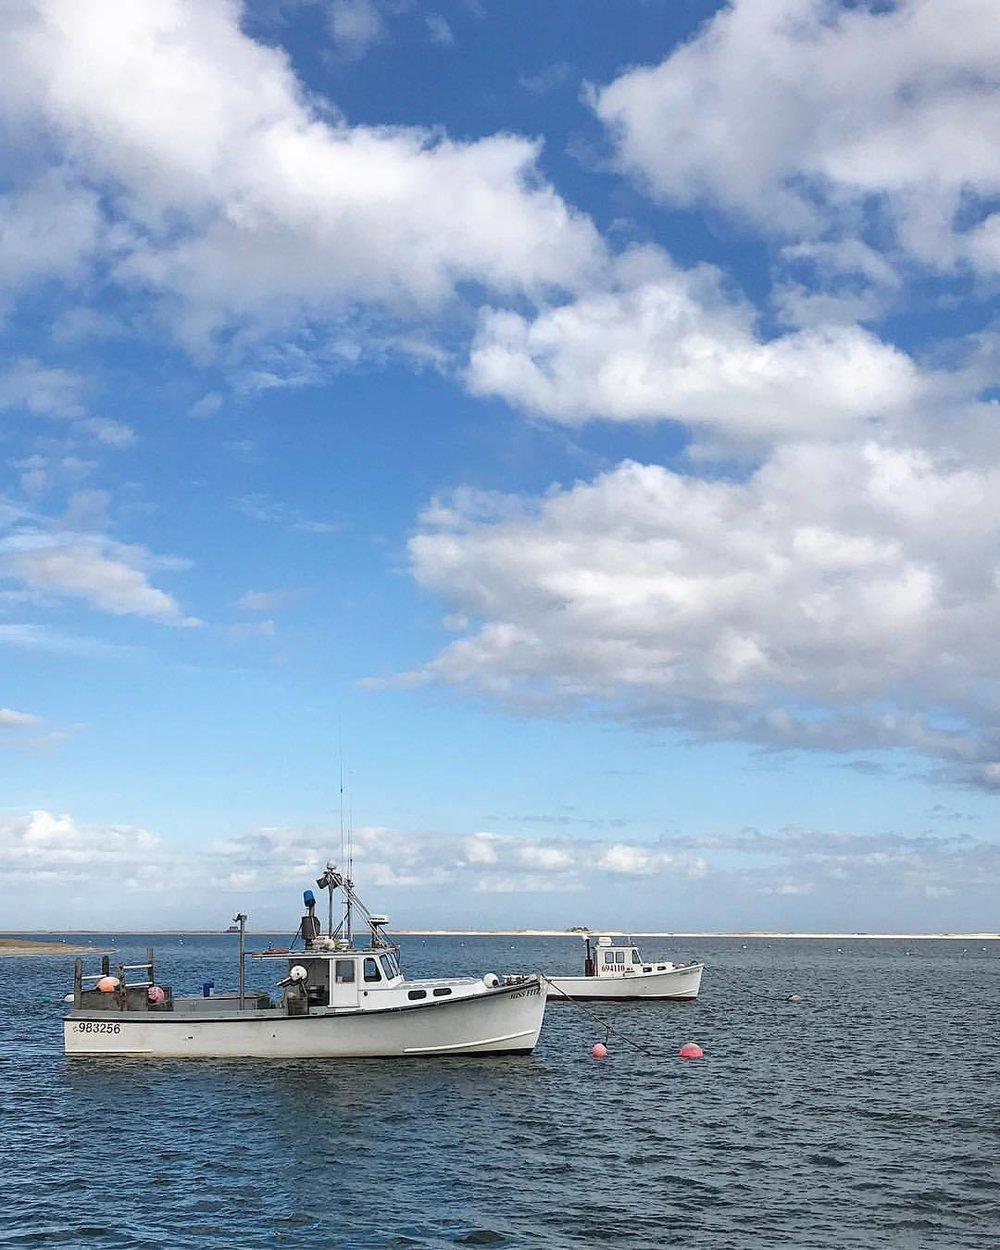 Fishing boats at rest.  -  #massachusetts #capecod #wintermeditation #fishing  (at Chatham, Cape Cod)